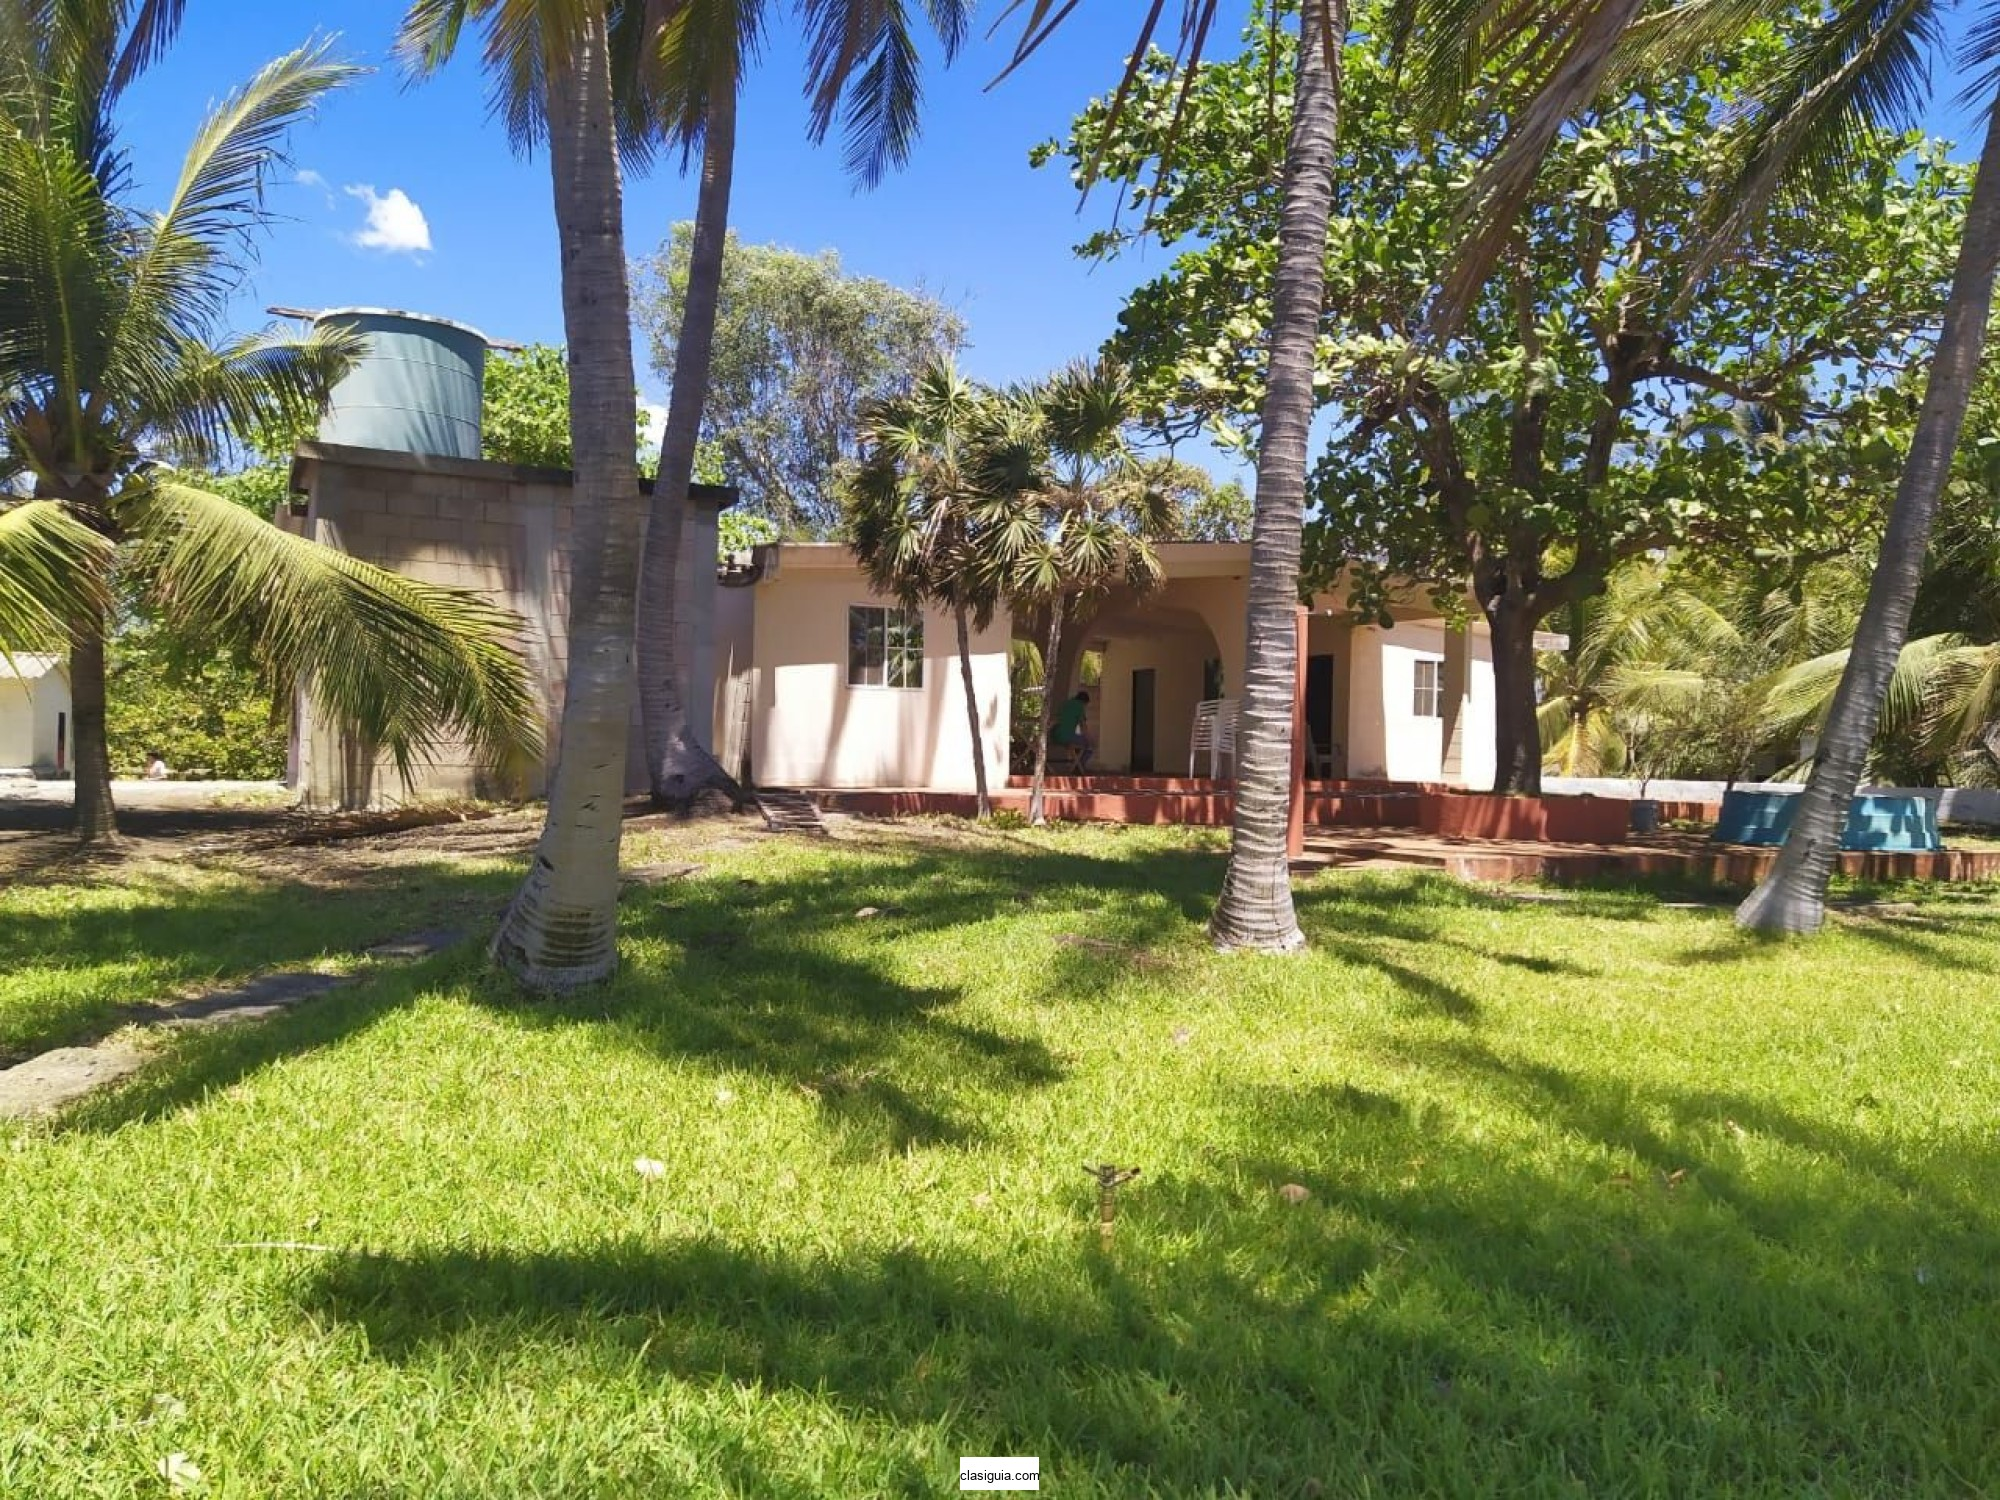 Vendo rancho 3,000 V2 frente a playa Barra Salada, Sonsonate